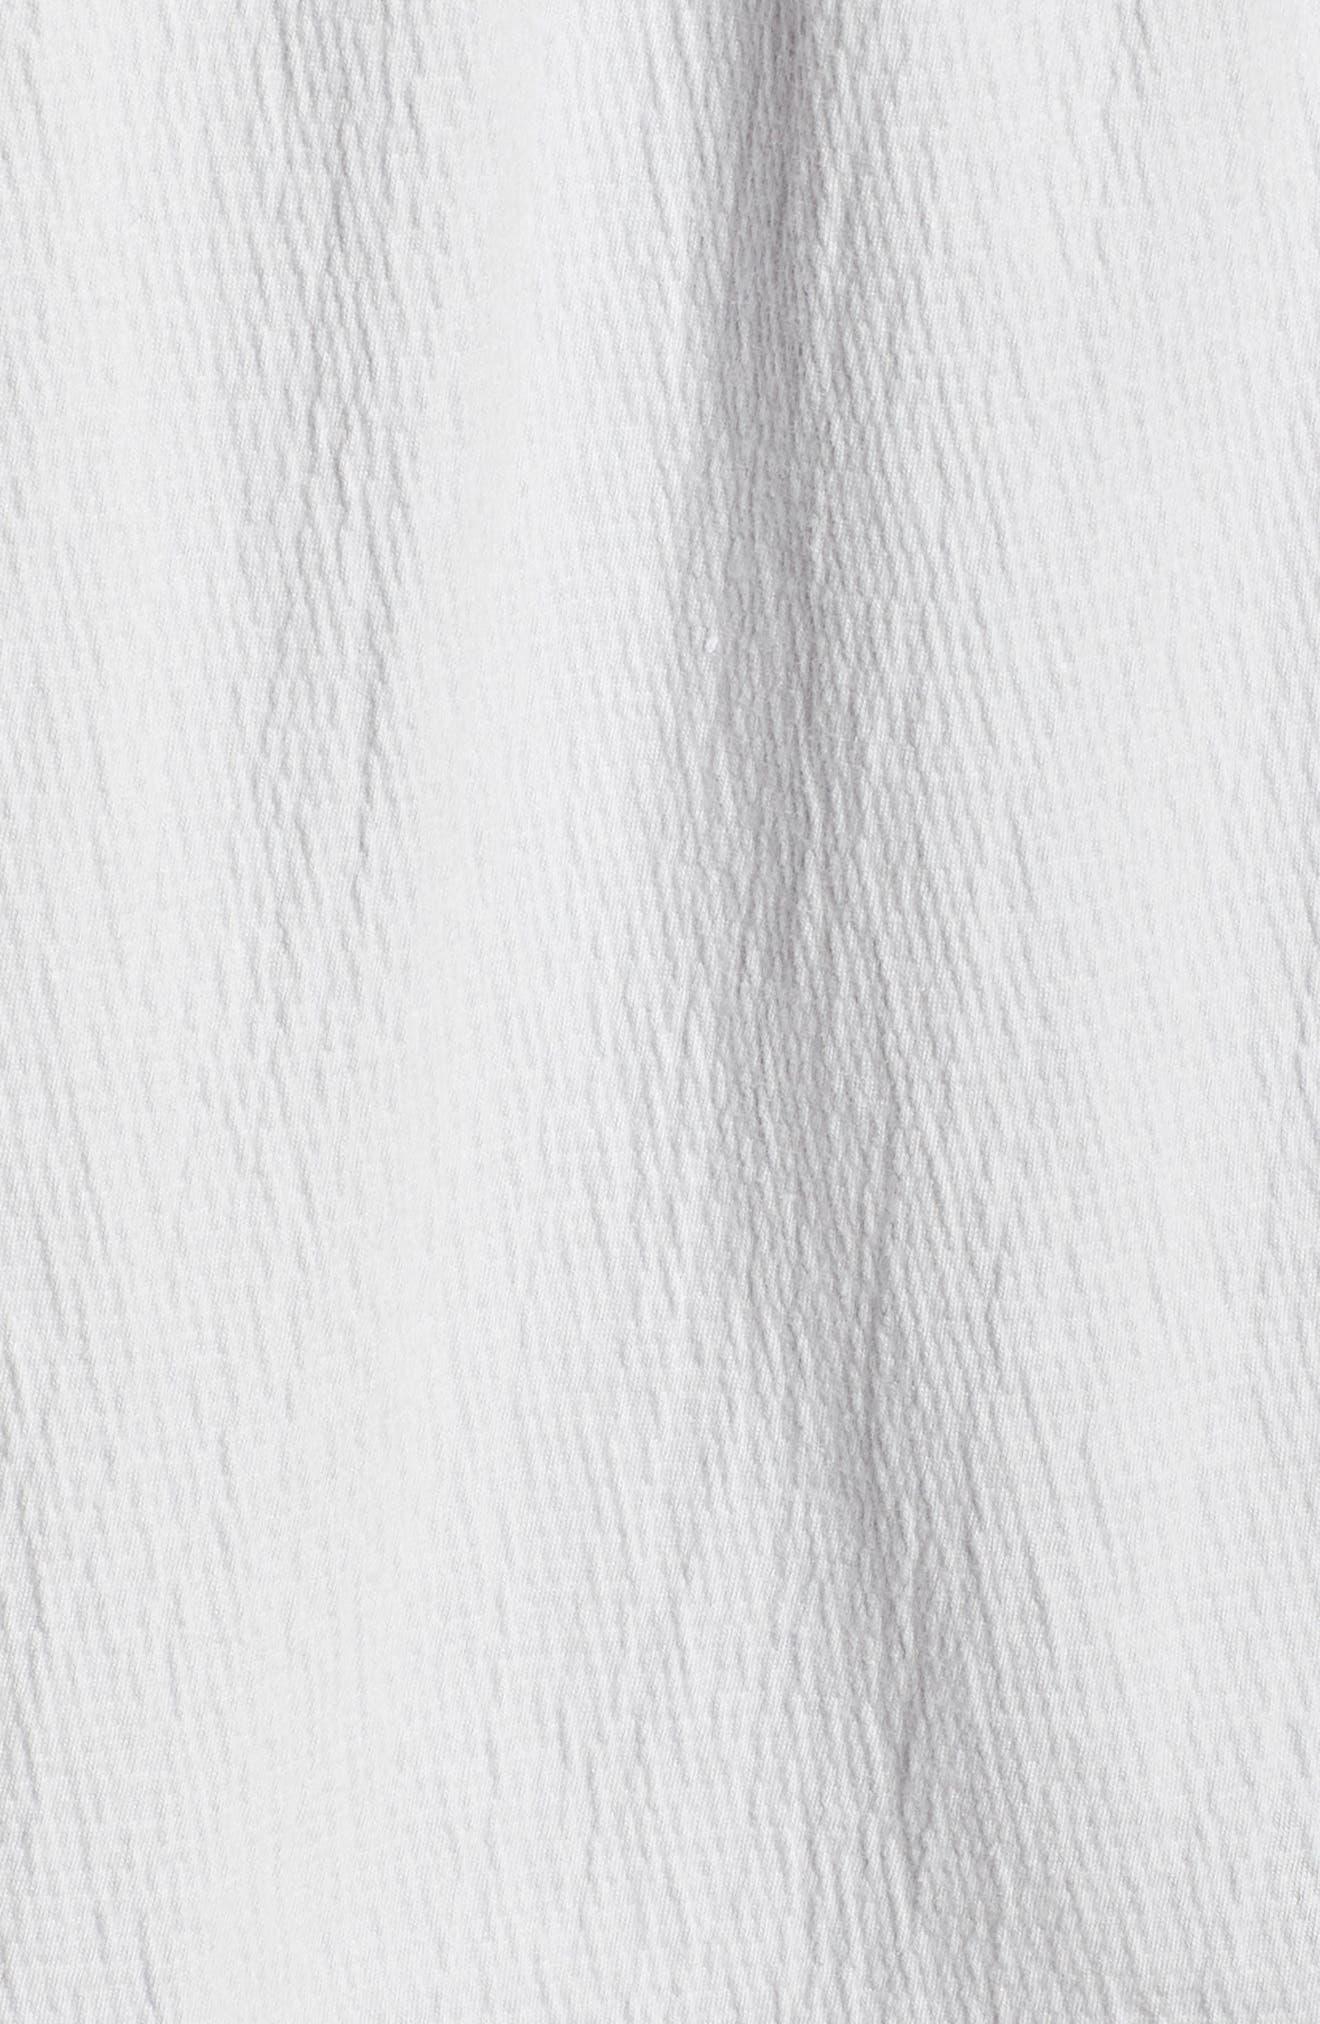 Ruffle Knit Top,                             Alternate thumbnail 6, color,                             030